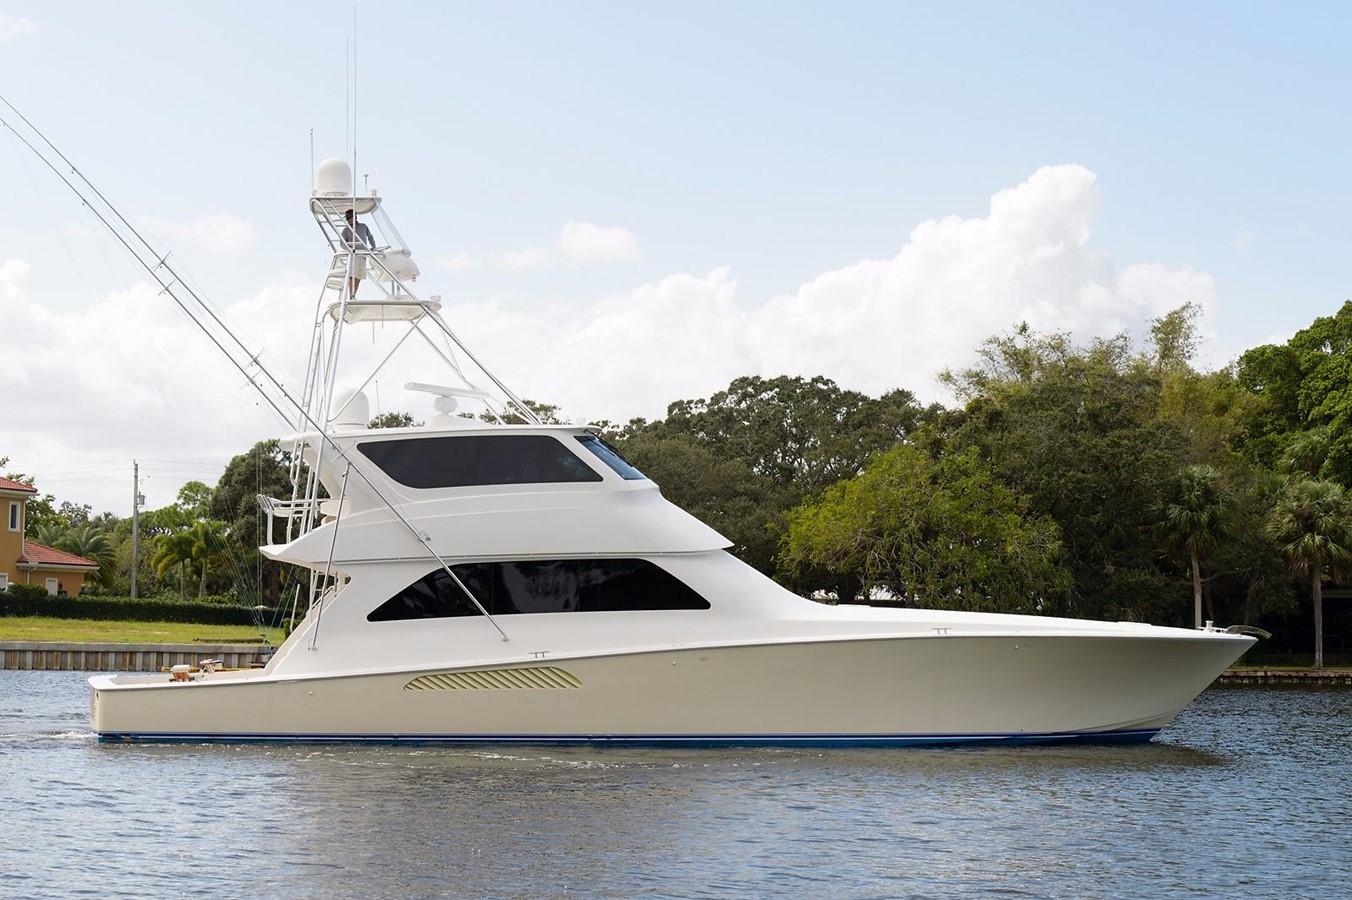 2007 Viking Yachts Enclosed Flybridge For Sale